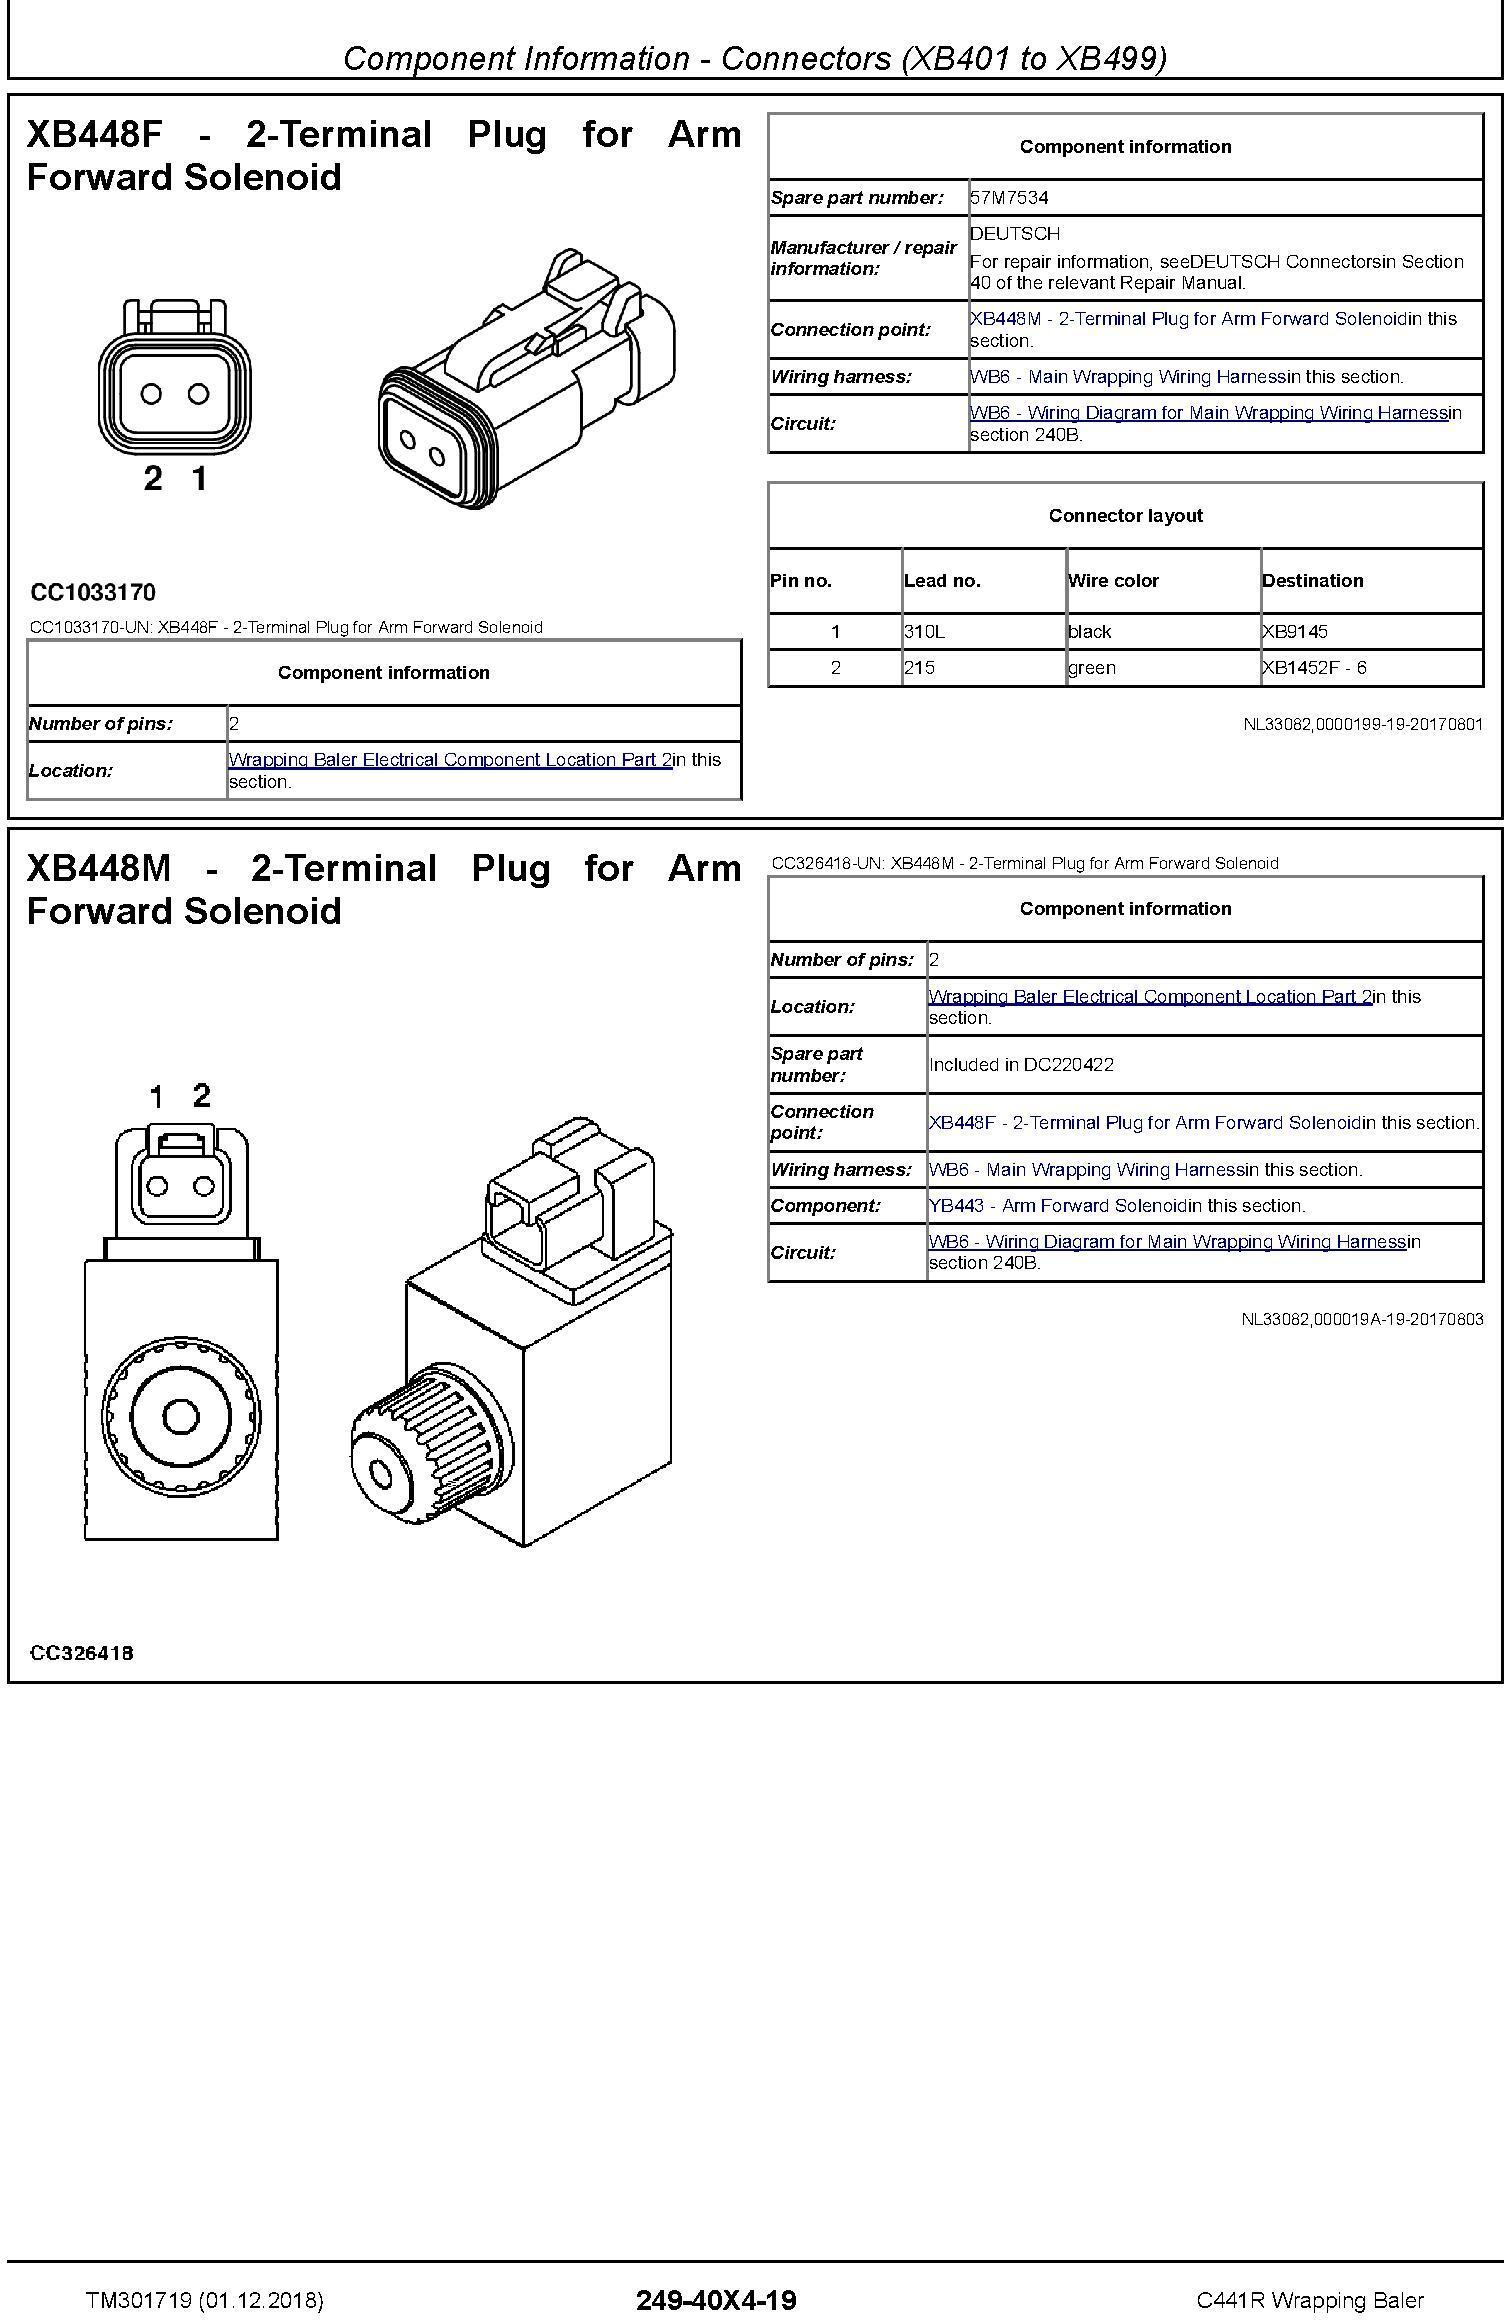 JD John Deere C441R Wrapping Baler Diagnostic Technical Service Manual (TM301719) - 1